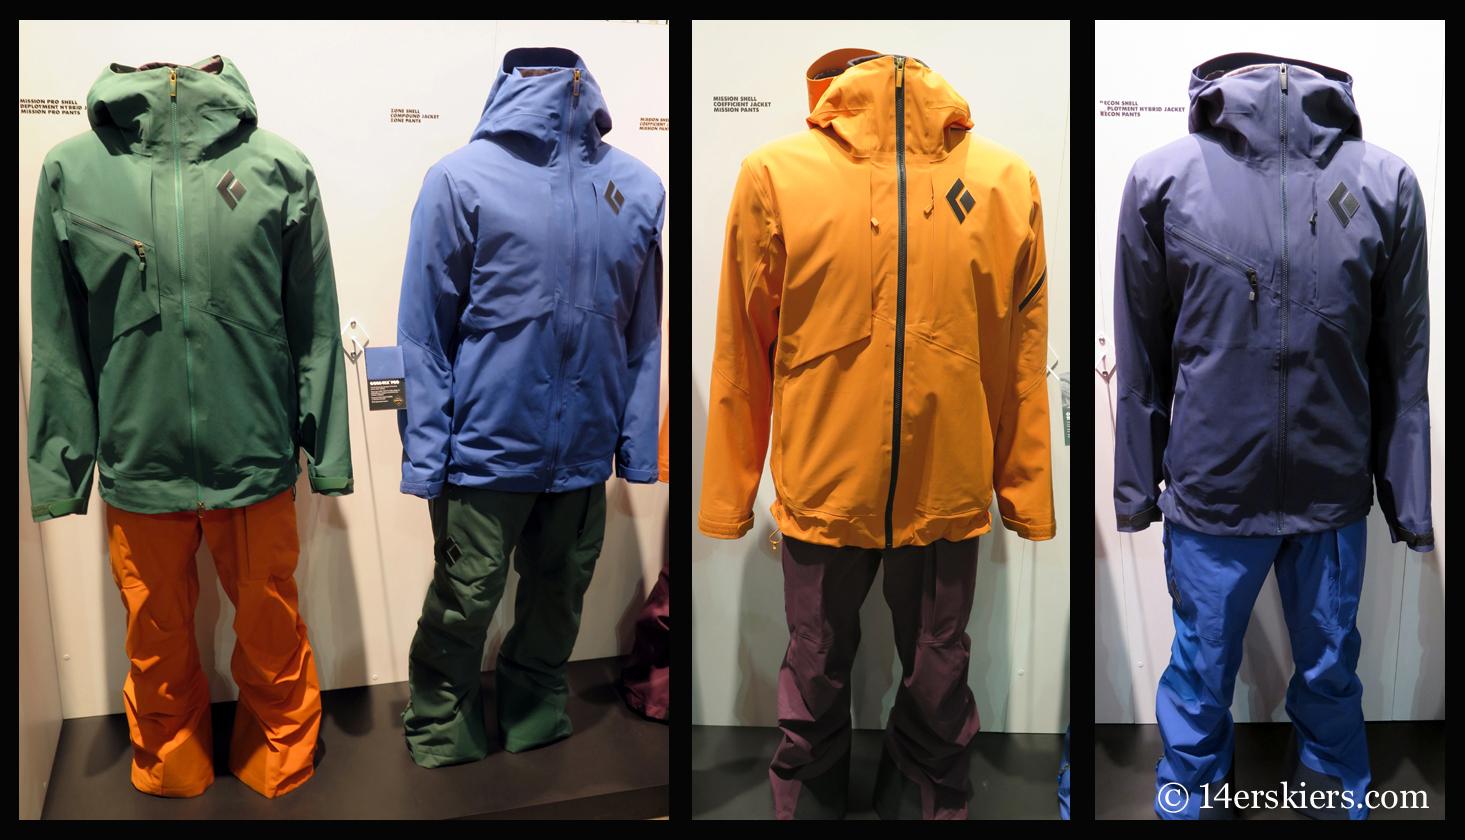 Black Diamond Ski Clothing & PIEPS Pocket